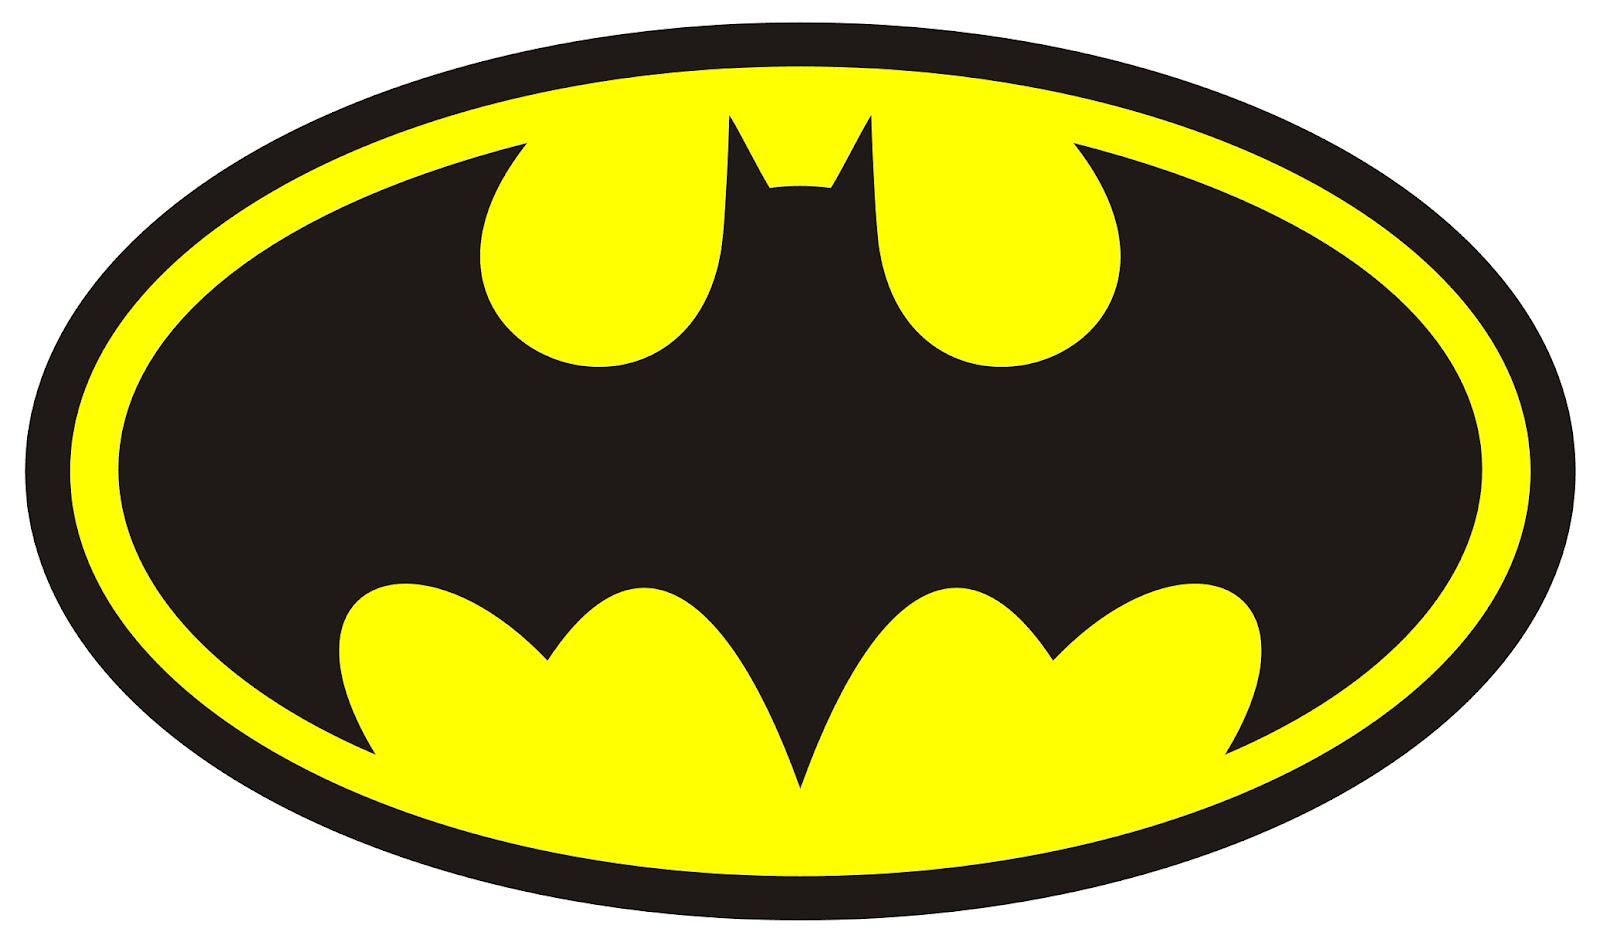 Batman logo clipart template clipart library stock Batman Logo Template - ClipArt Best clipart library stock